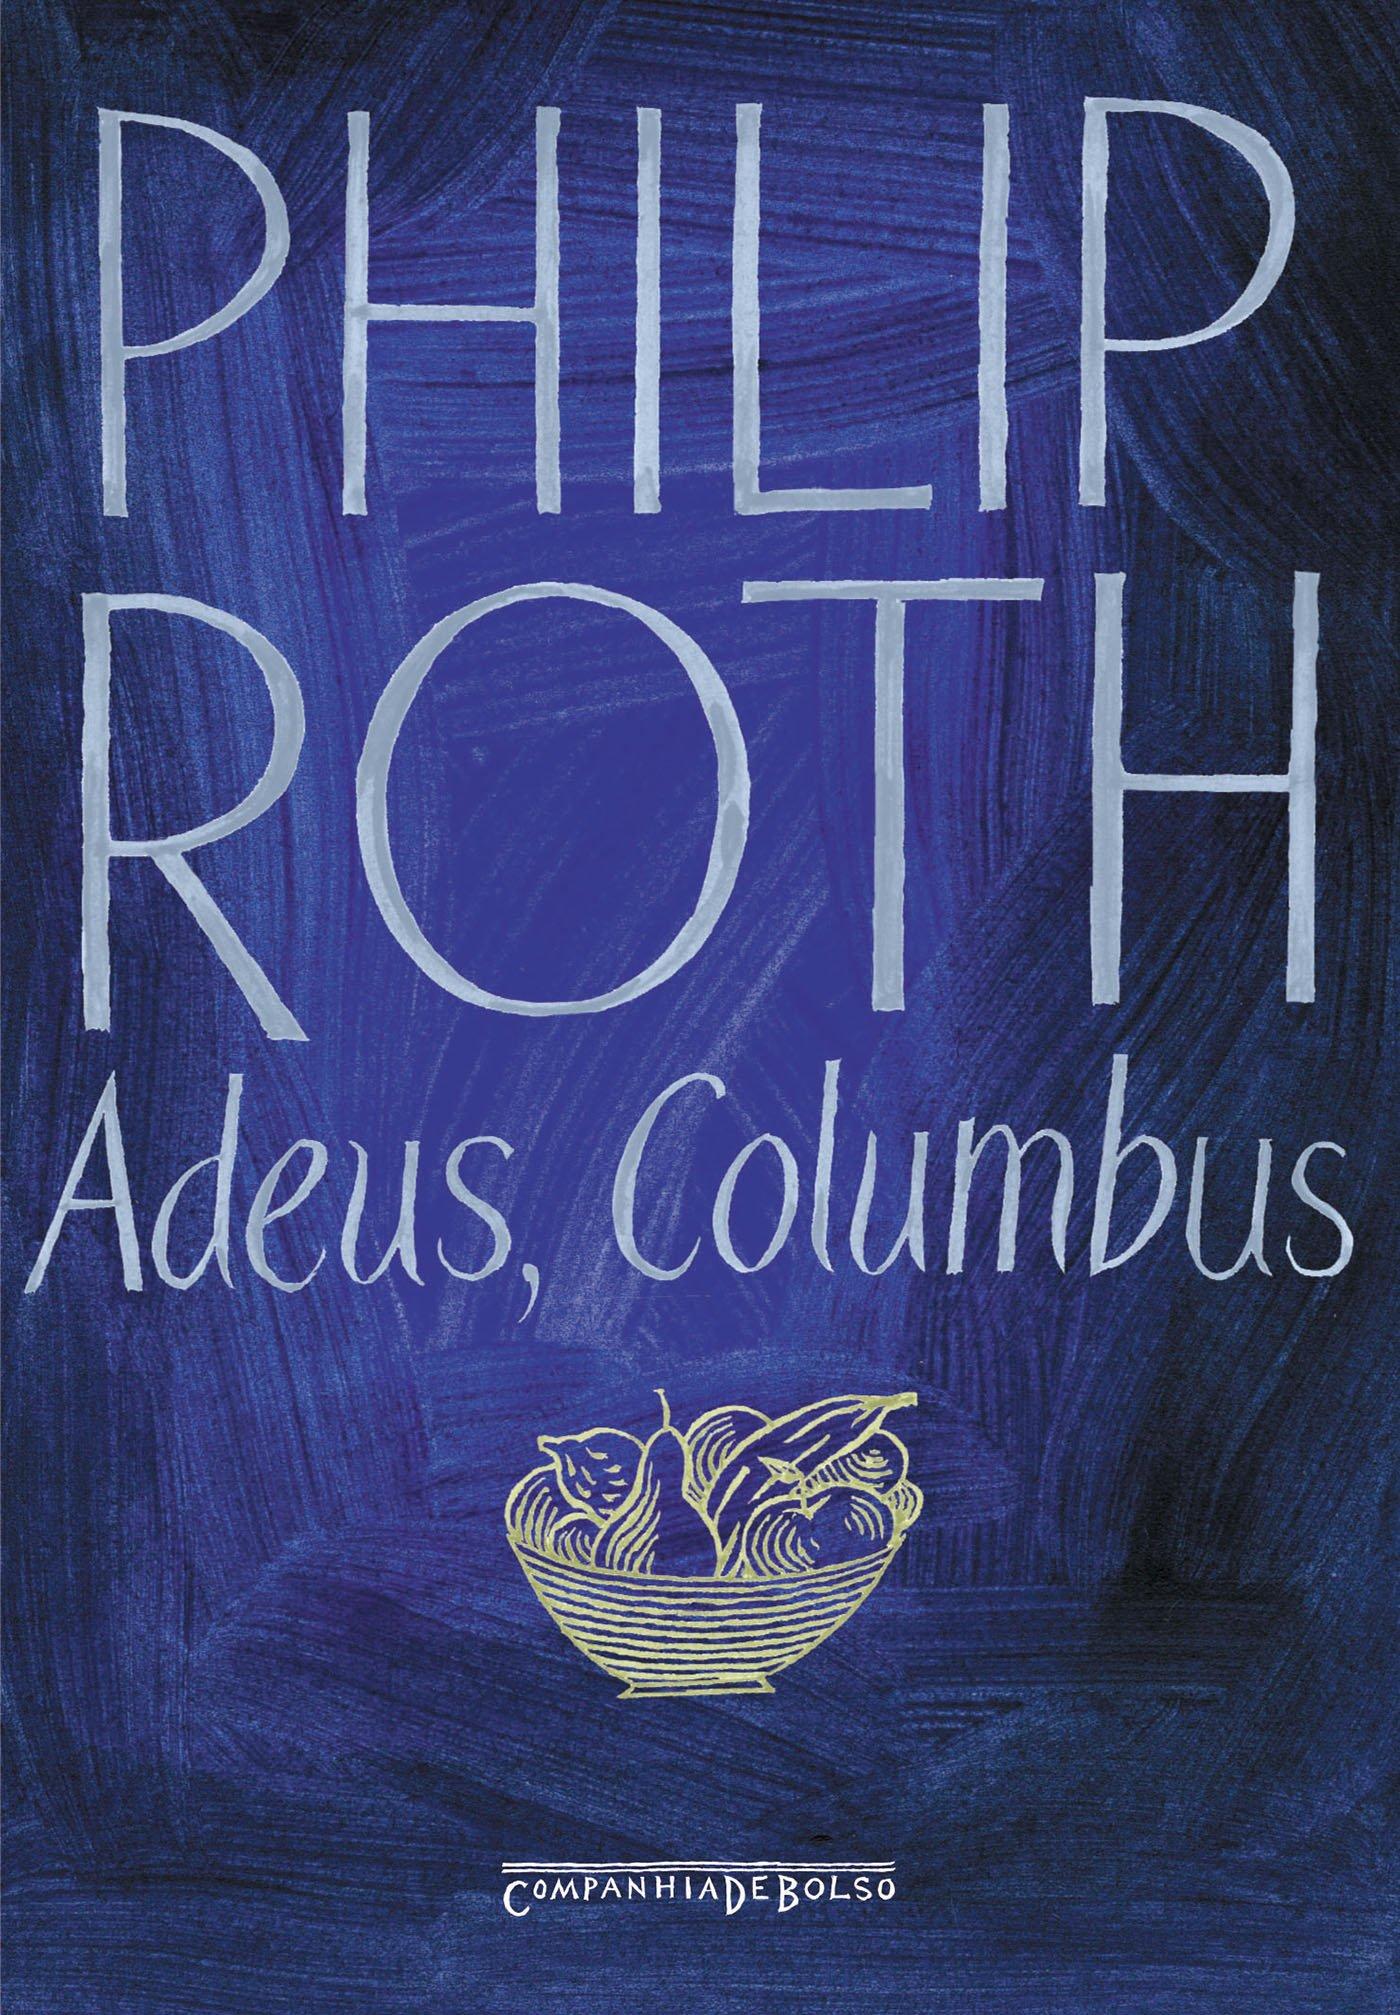 Adeus, Columbus - Livro de Bolso